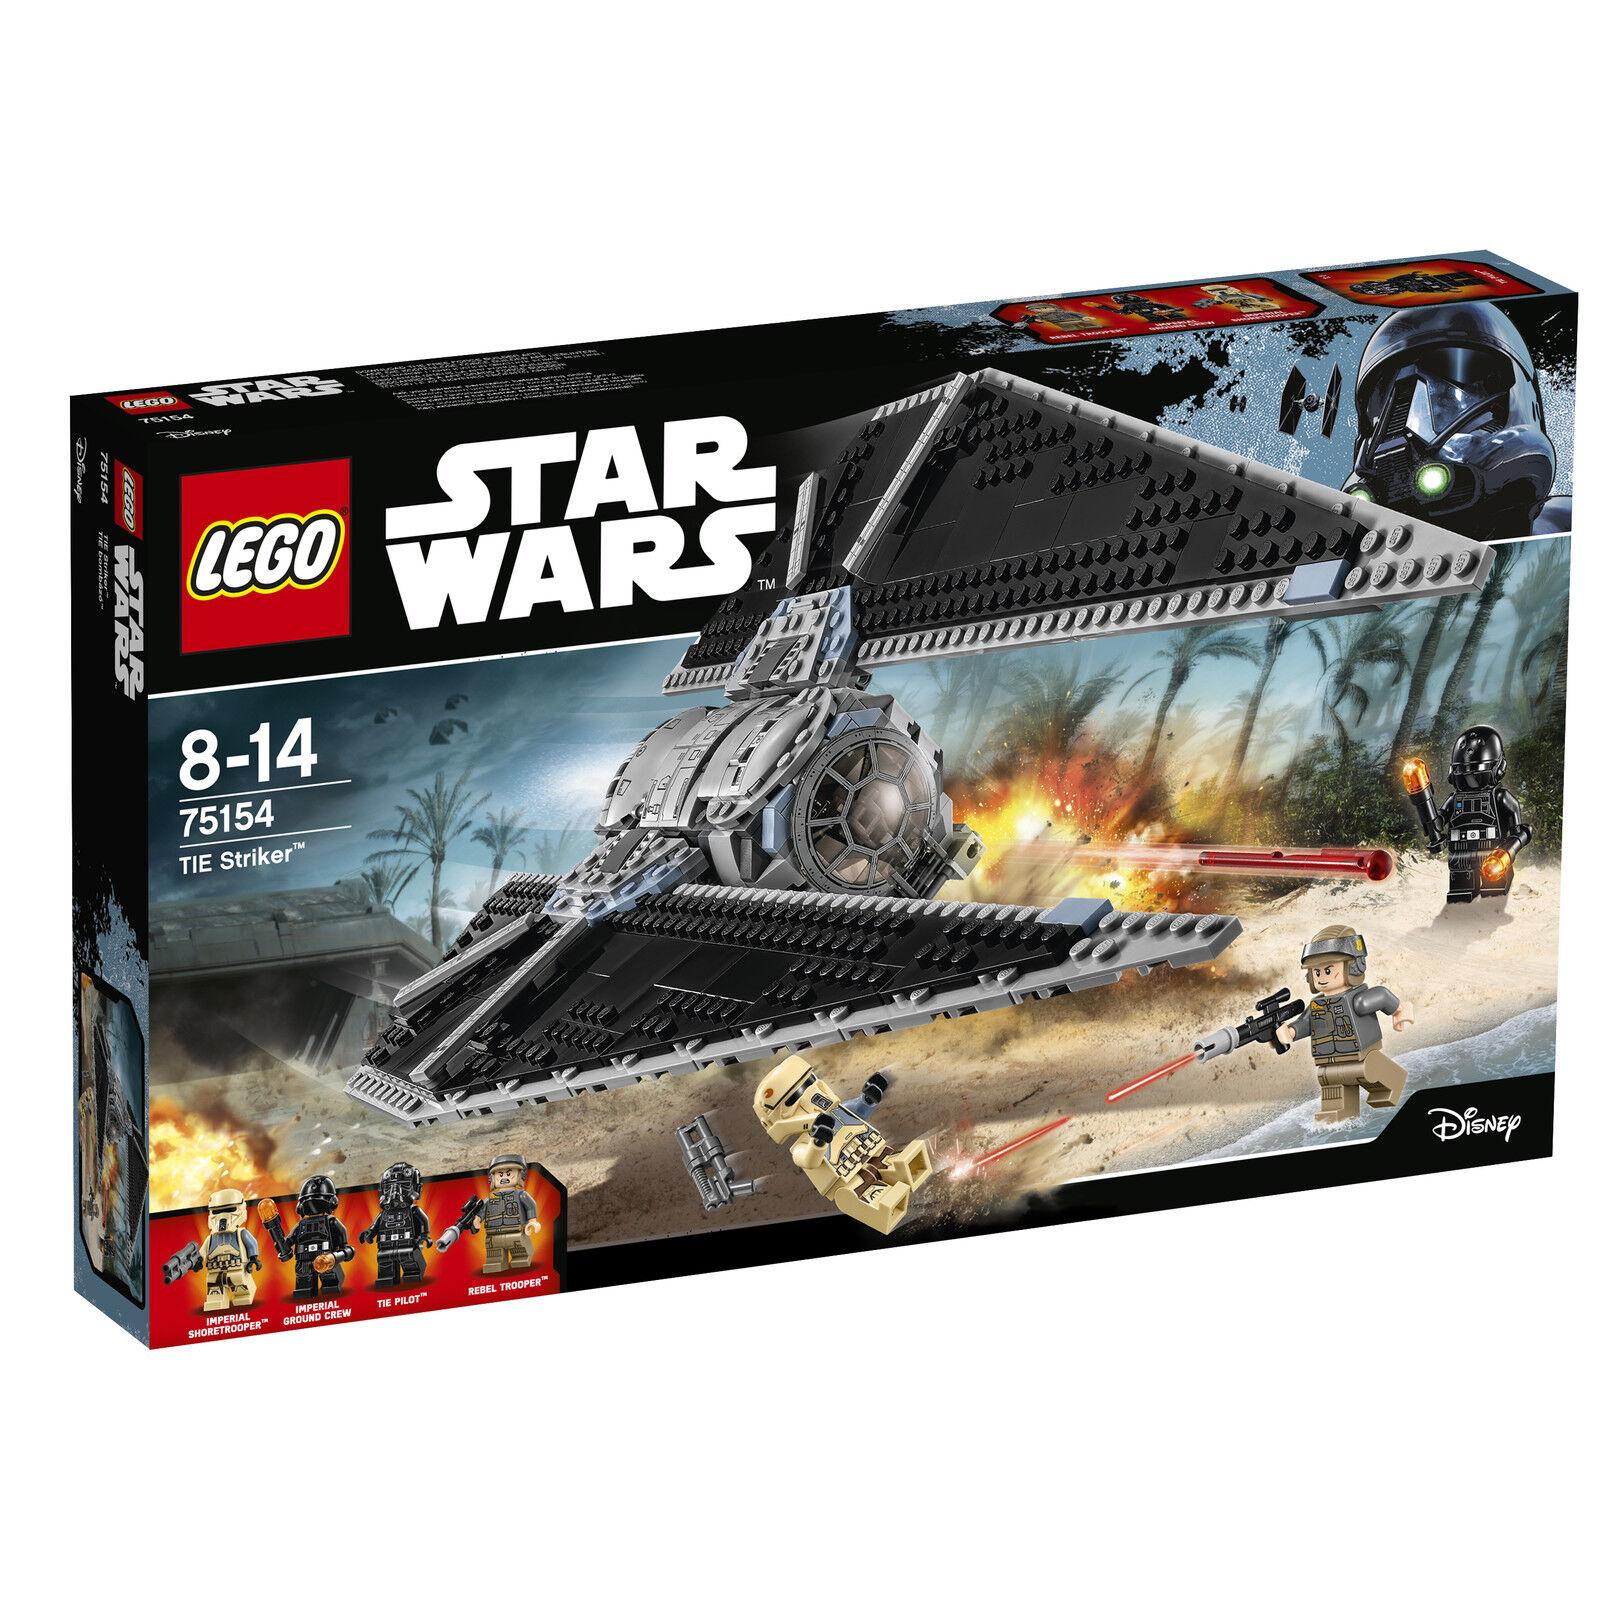 LEGO ® Star Wars ™ 75154 TIE Striker ™ NUOVO OVP NEW MISB NRFB